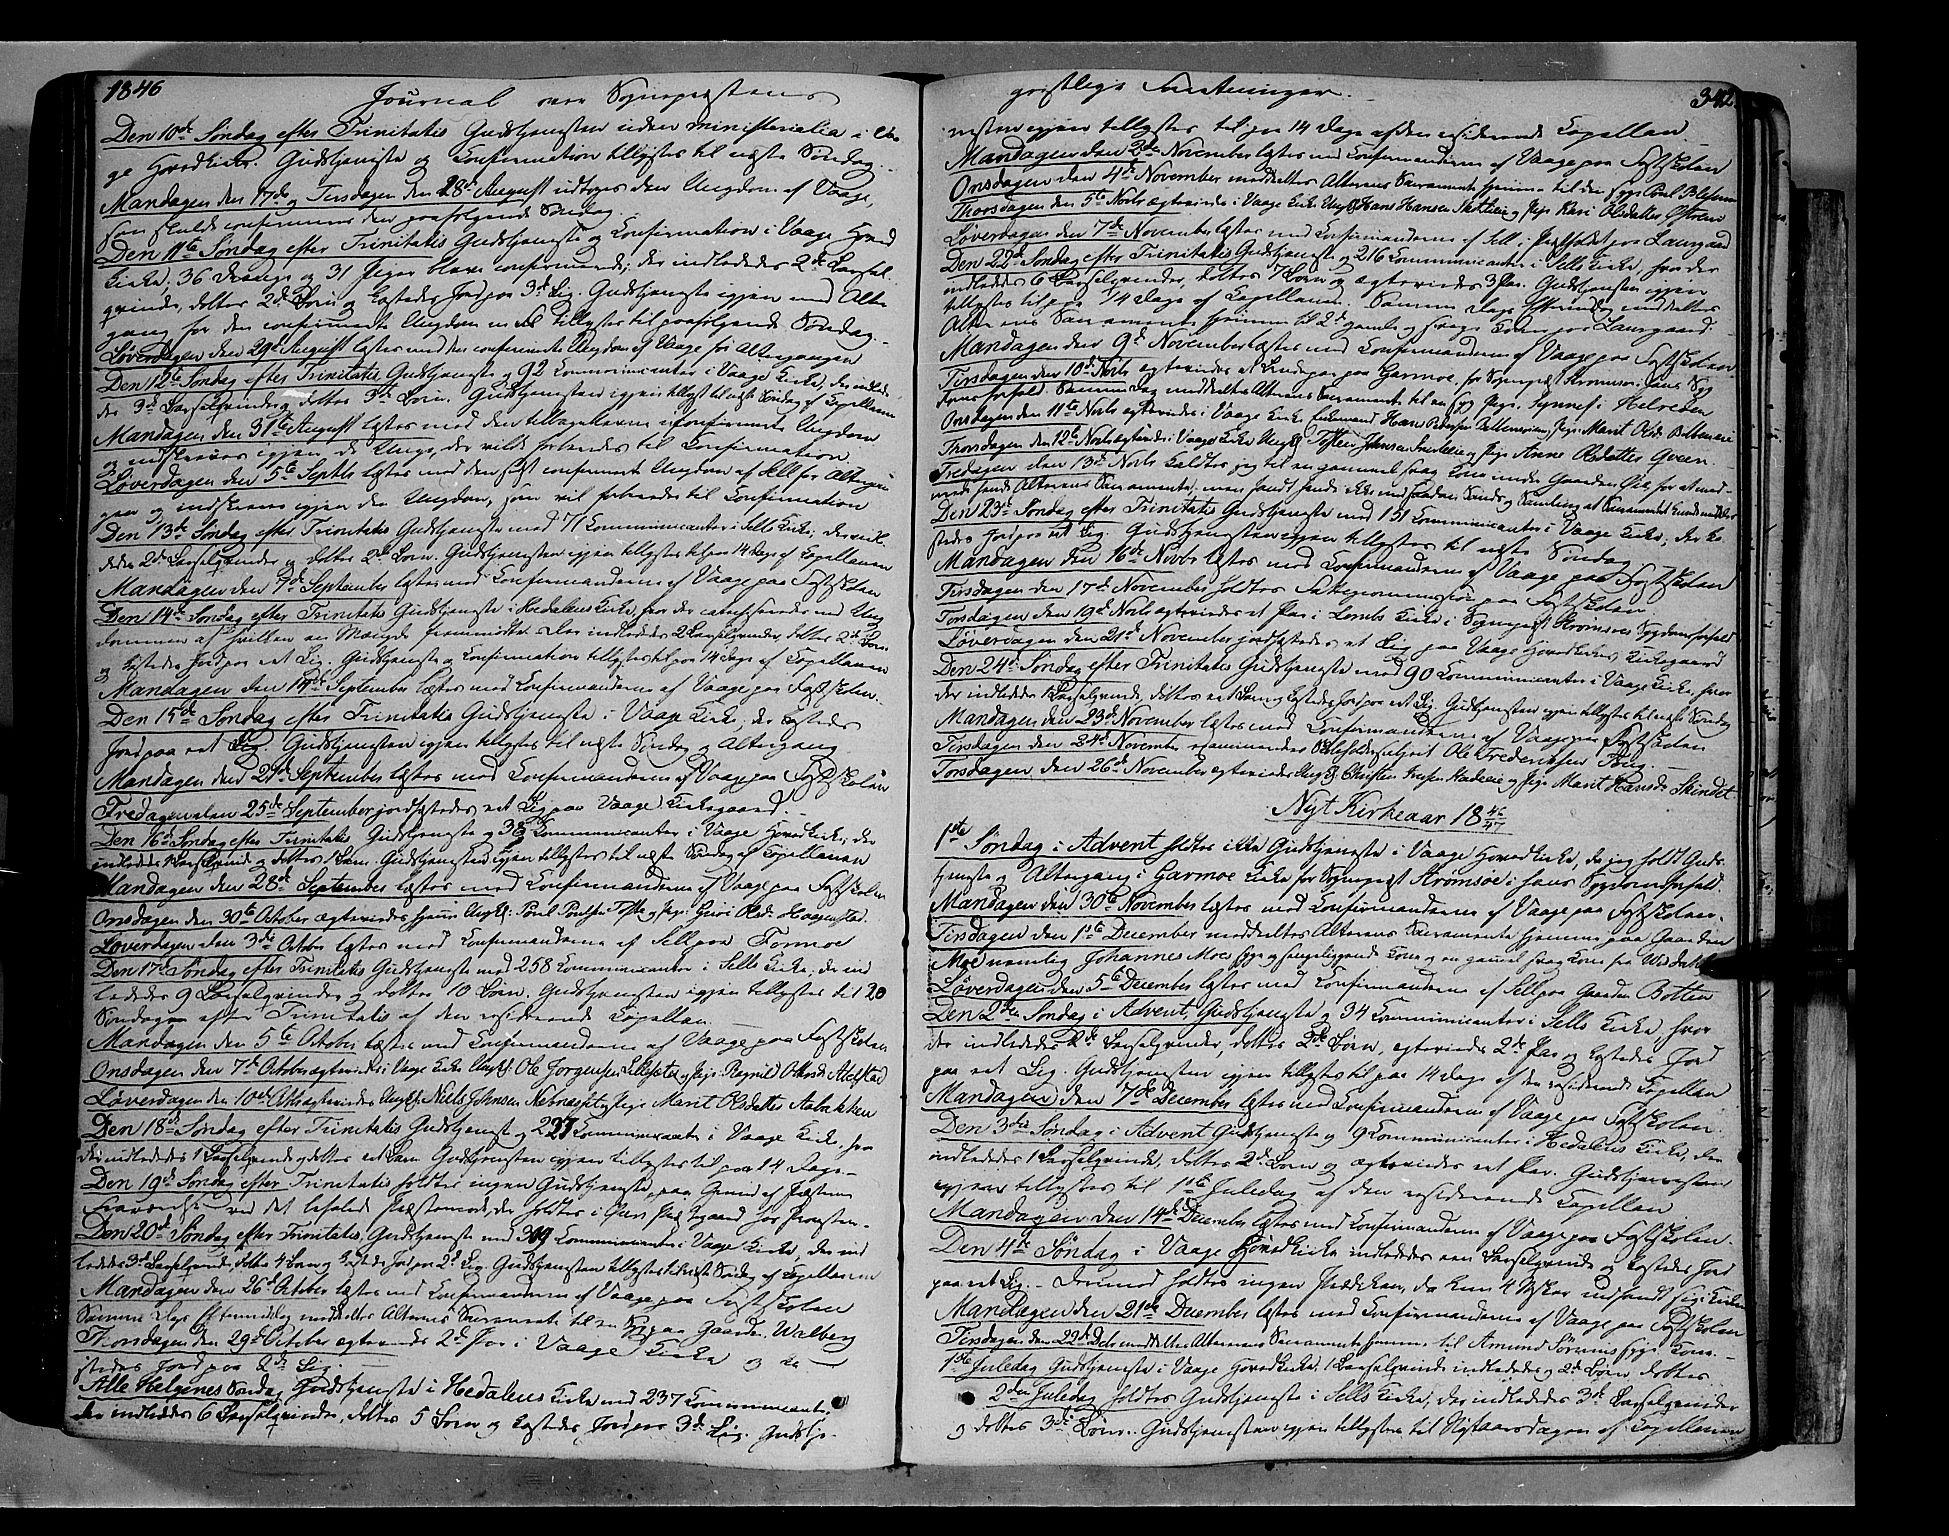 SAH, Vågå prestekontor, Ministerialbok nr. 5 /1, 1842-1856, s. 342